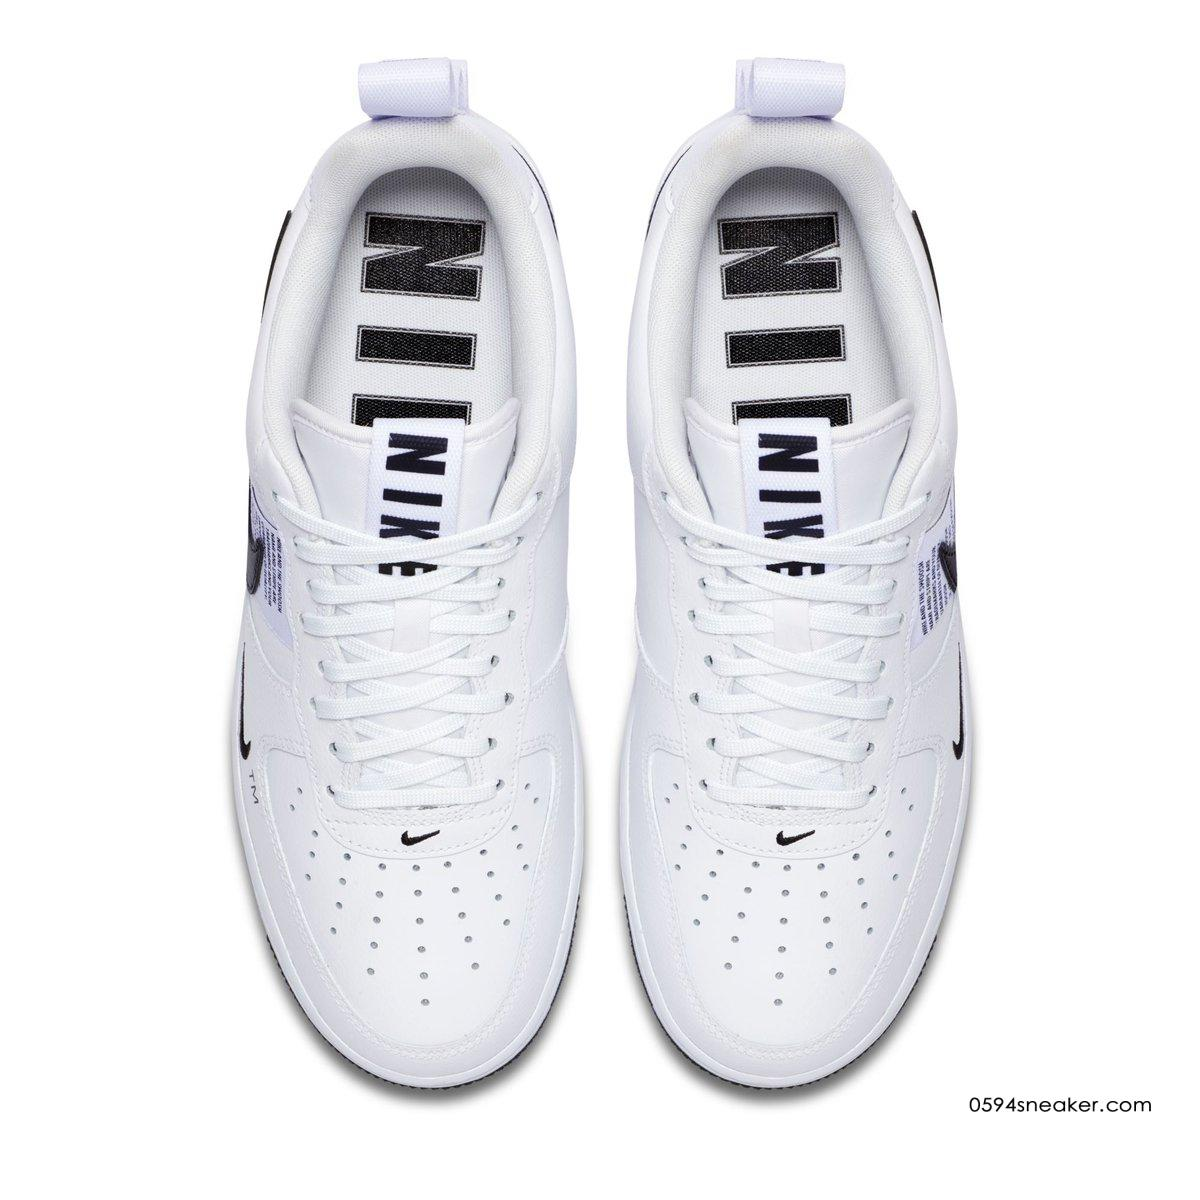 耐克板鞋空军全新设计 Nike Air Force 1 '07 LV8 Utility